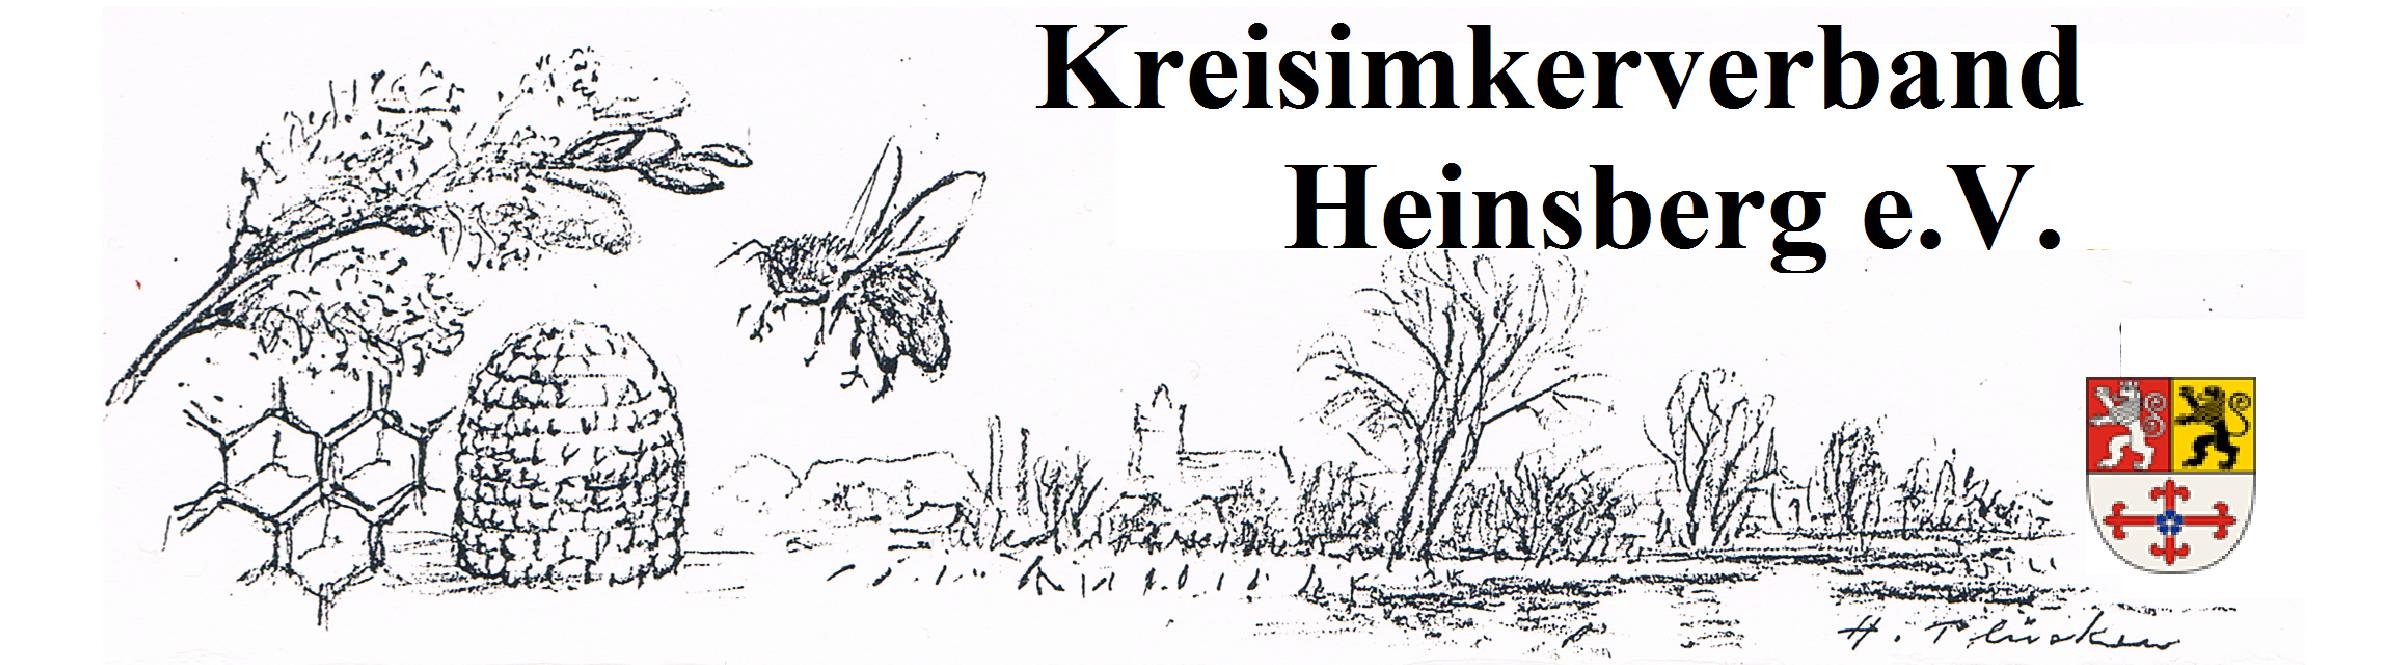 Kreisimkerverband Heinsberg e.V.